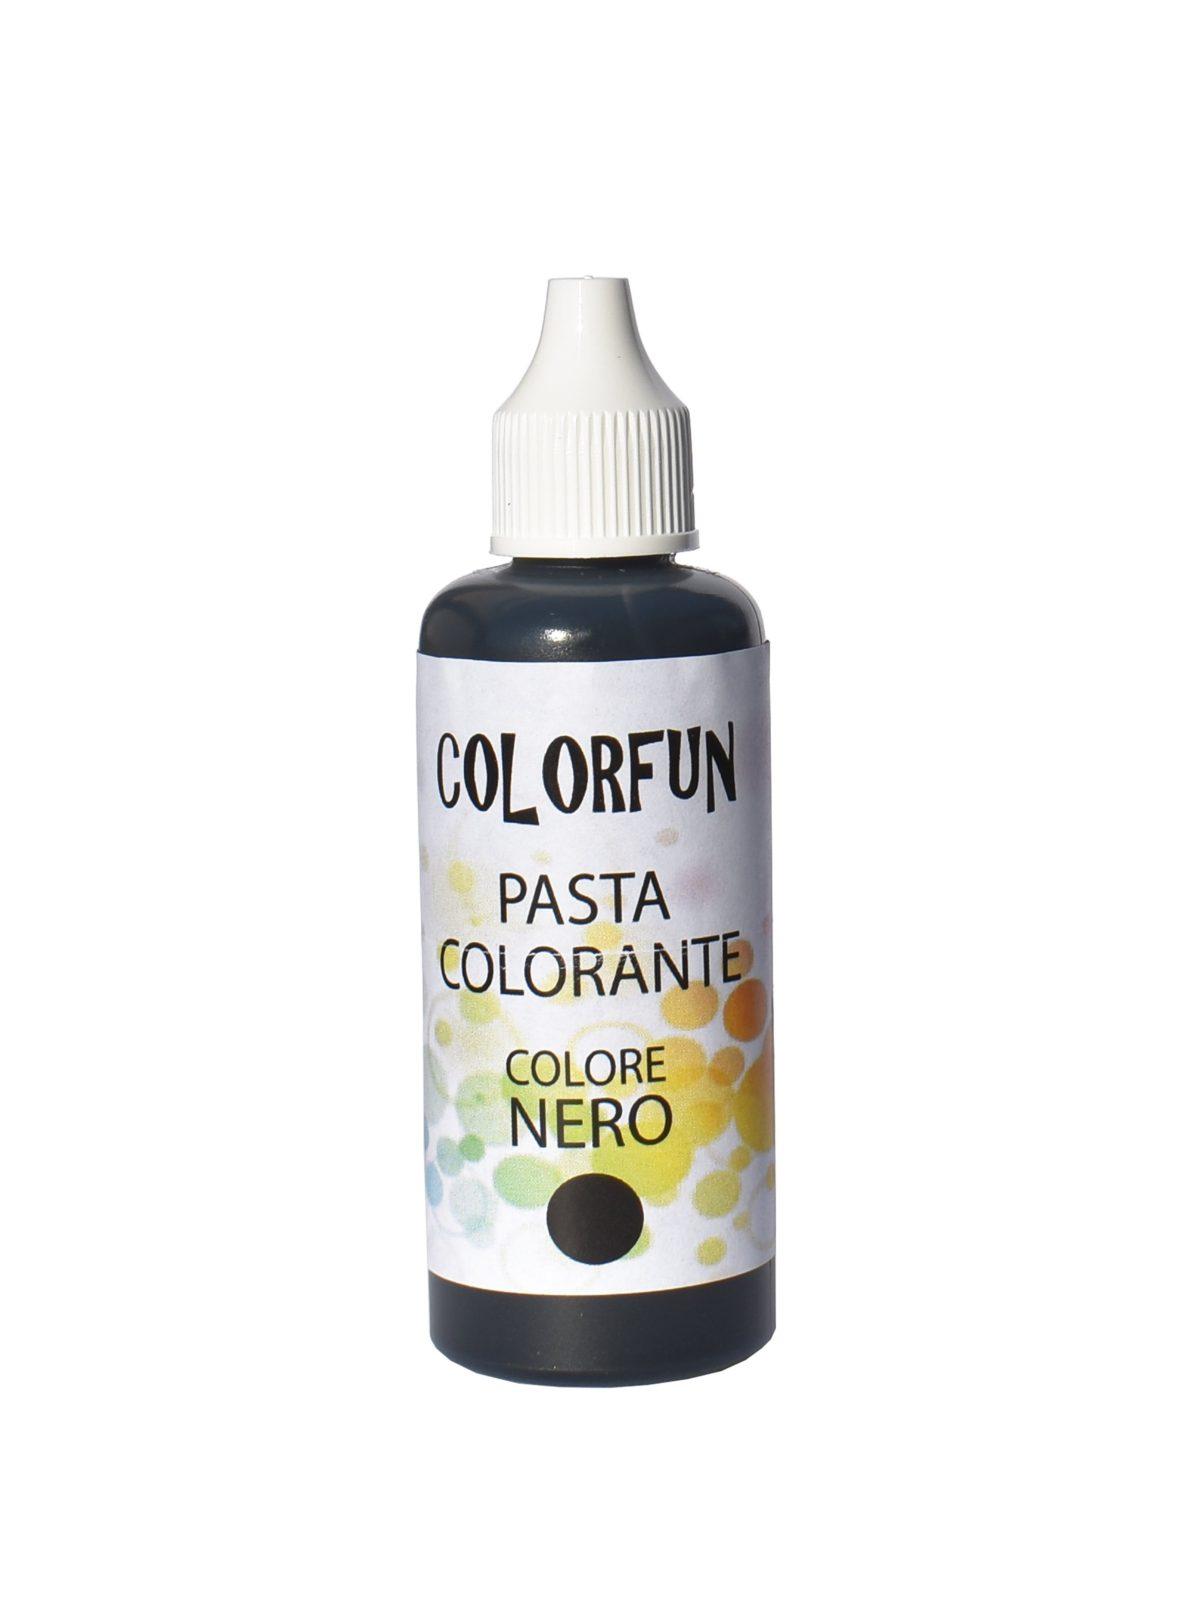 COLORFUN - PATE COLORANTE POUR RESINES EPOXY ET POLYURETHANE